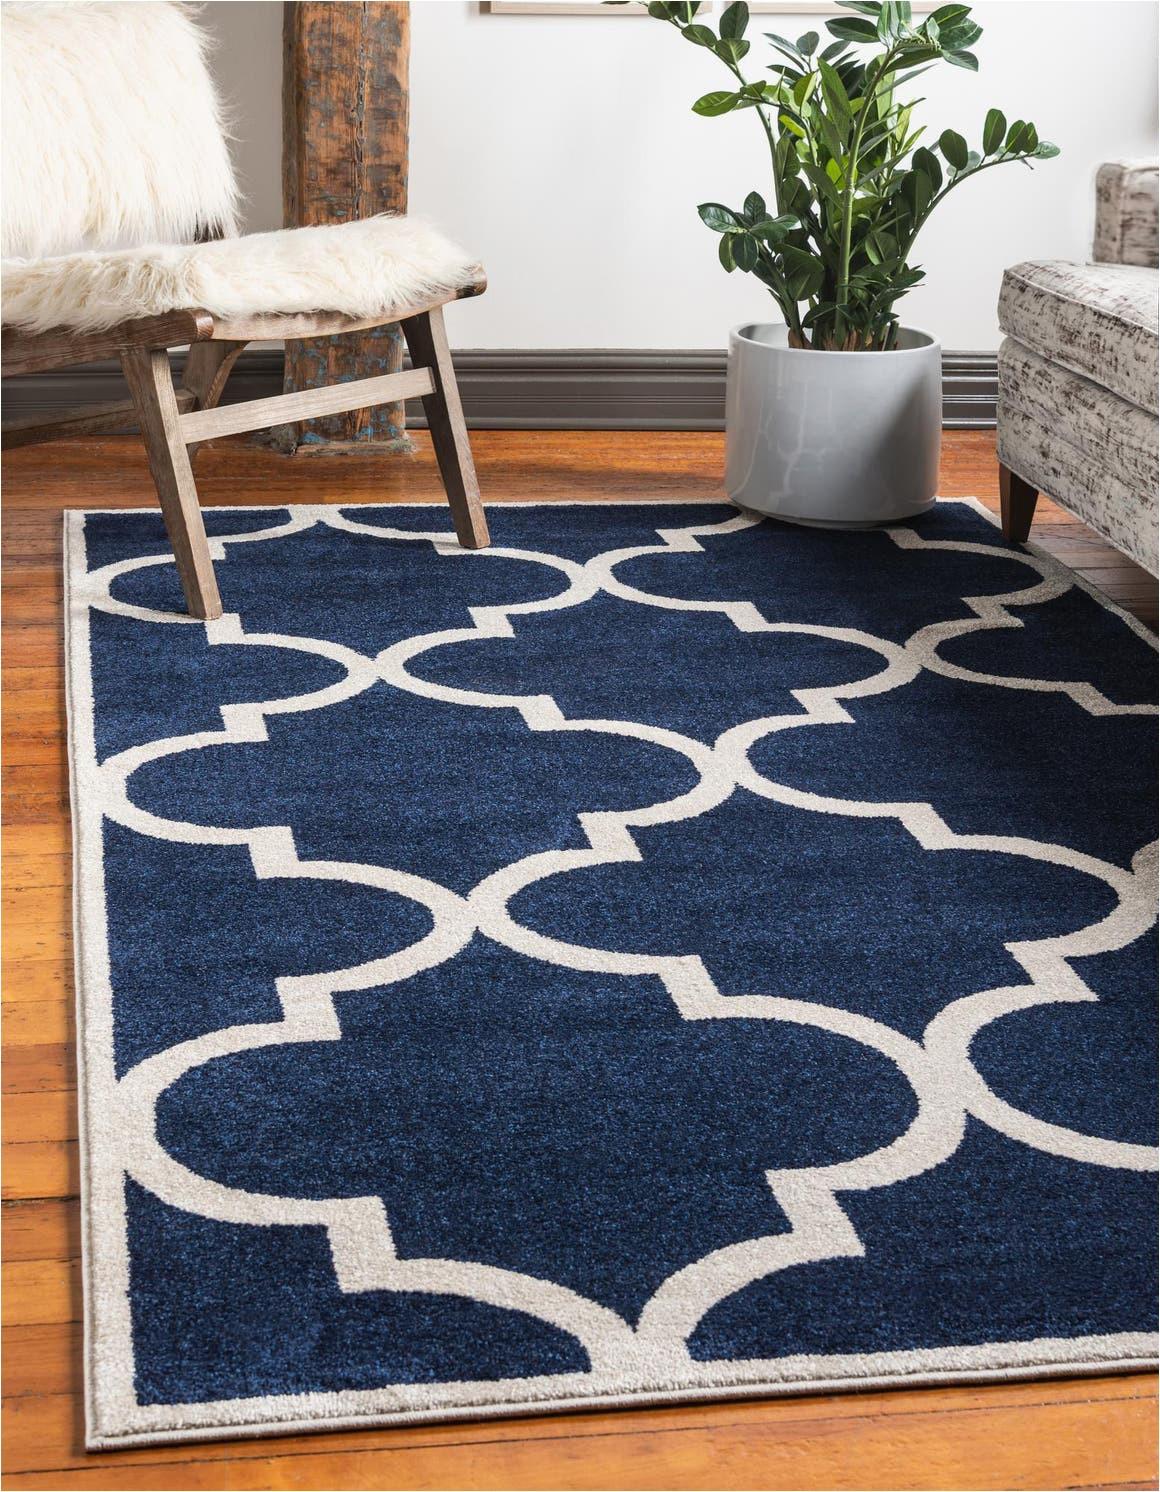 navy blue 7x10 trellis area rug